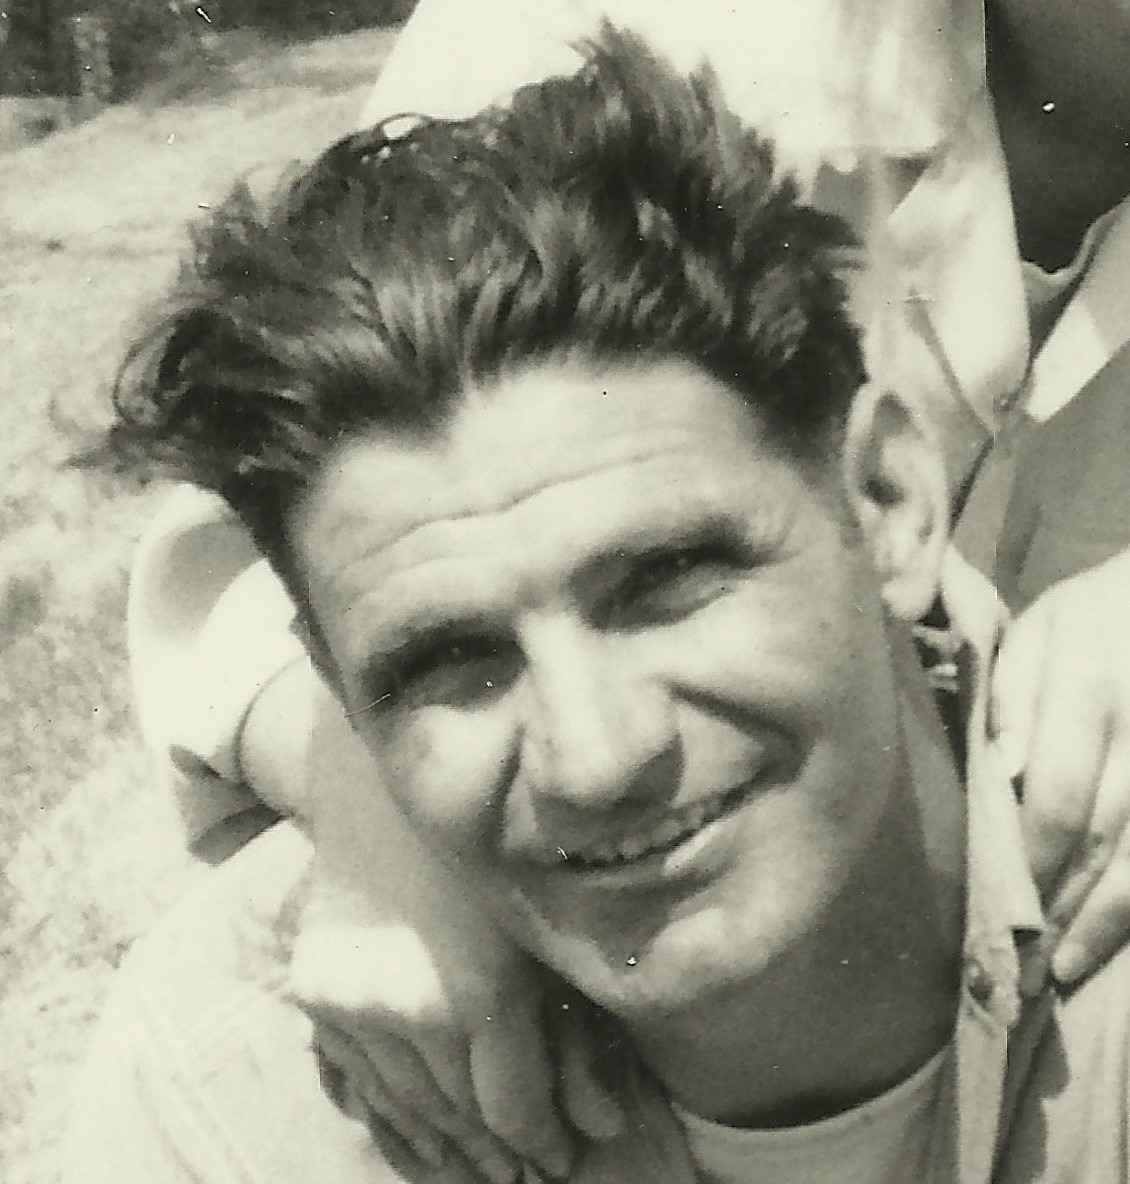 Clementz A. Williams